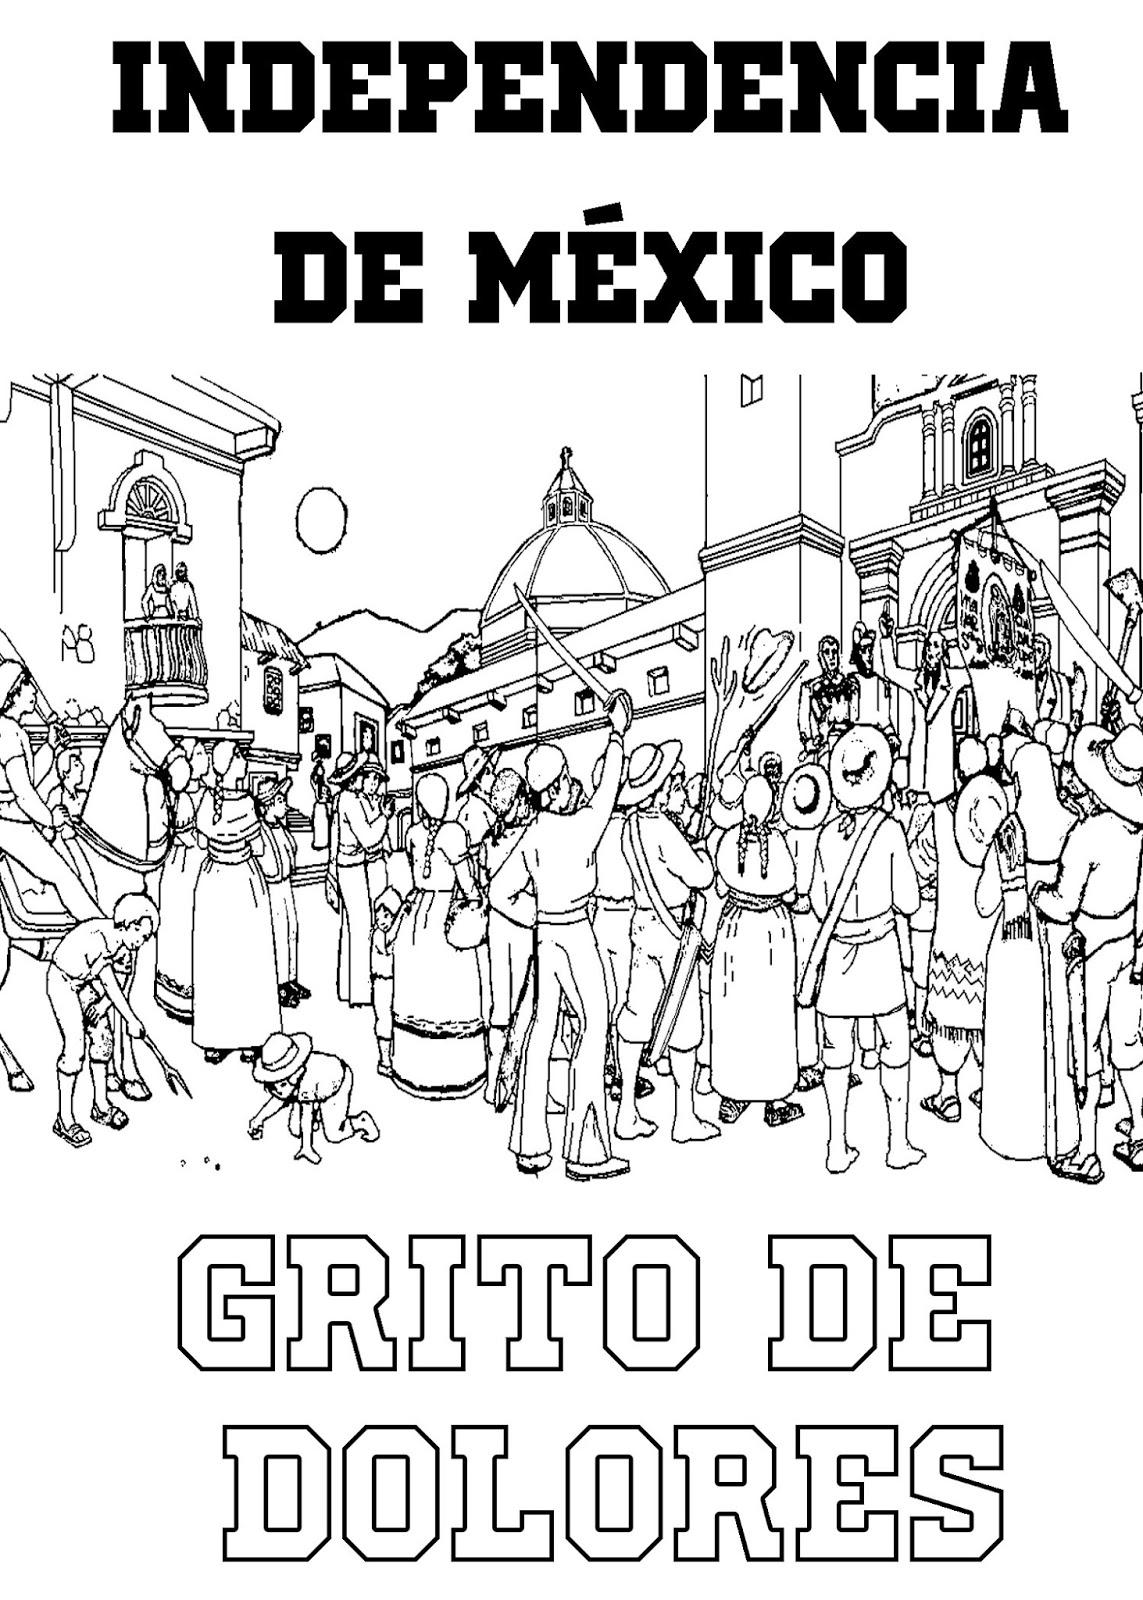 Pinto Dibujos Independencia De Mexico Para Colorear 16 De